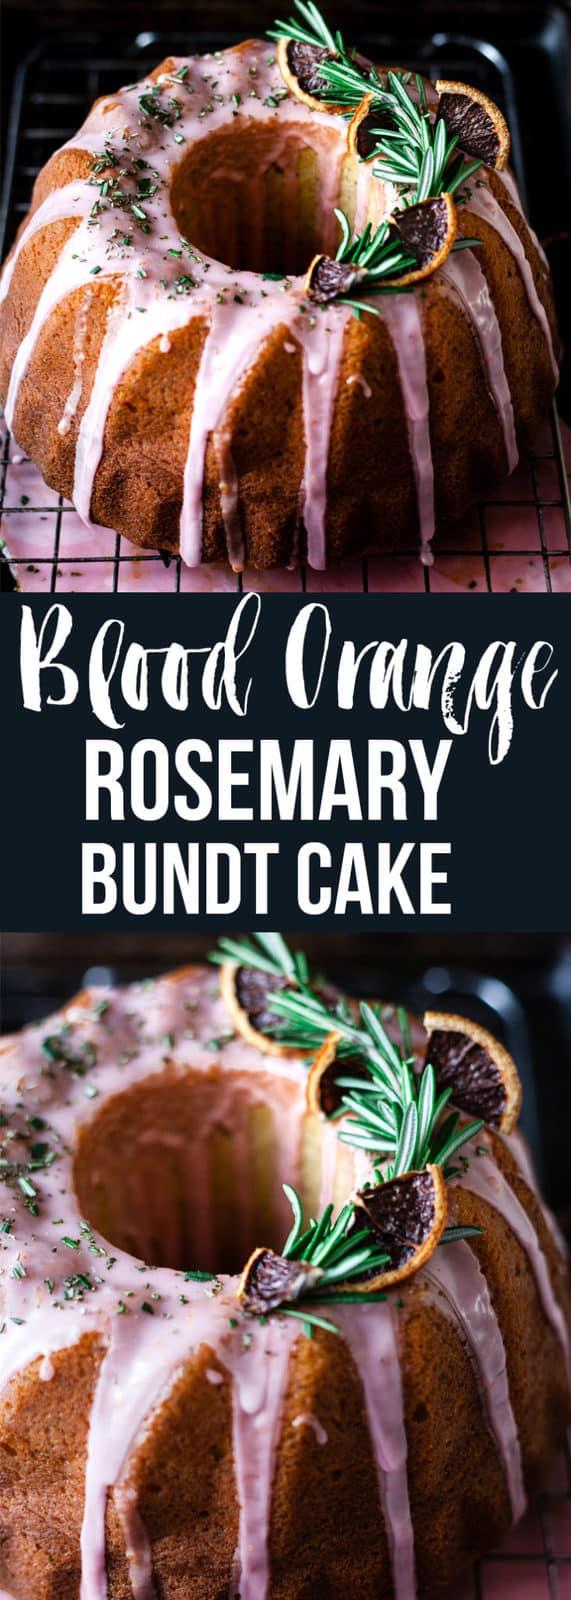 Blood orange rosemary bundt cake with buttermilk and poppy seeds. A healing winter cake. #cake #bundt #dessert #breakfast